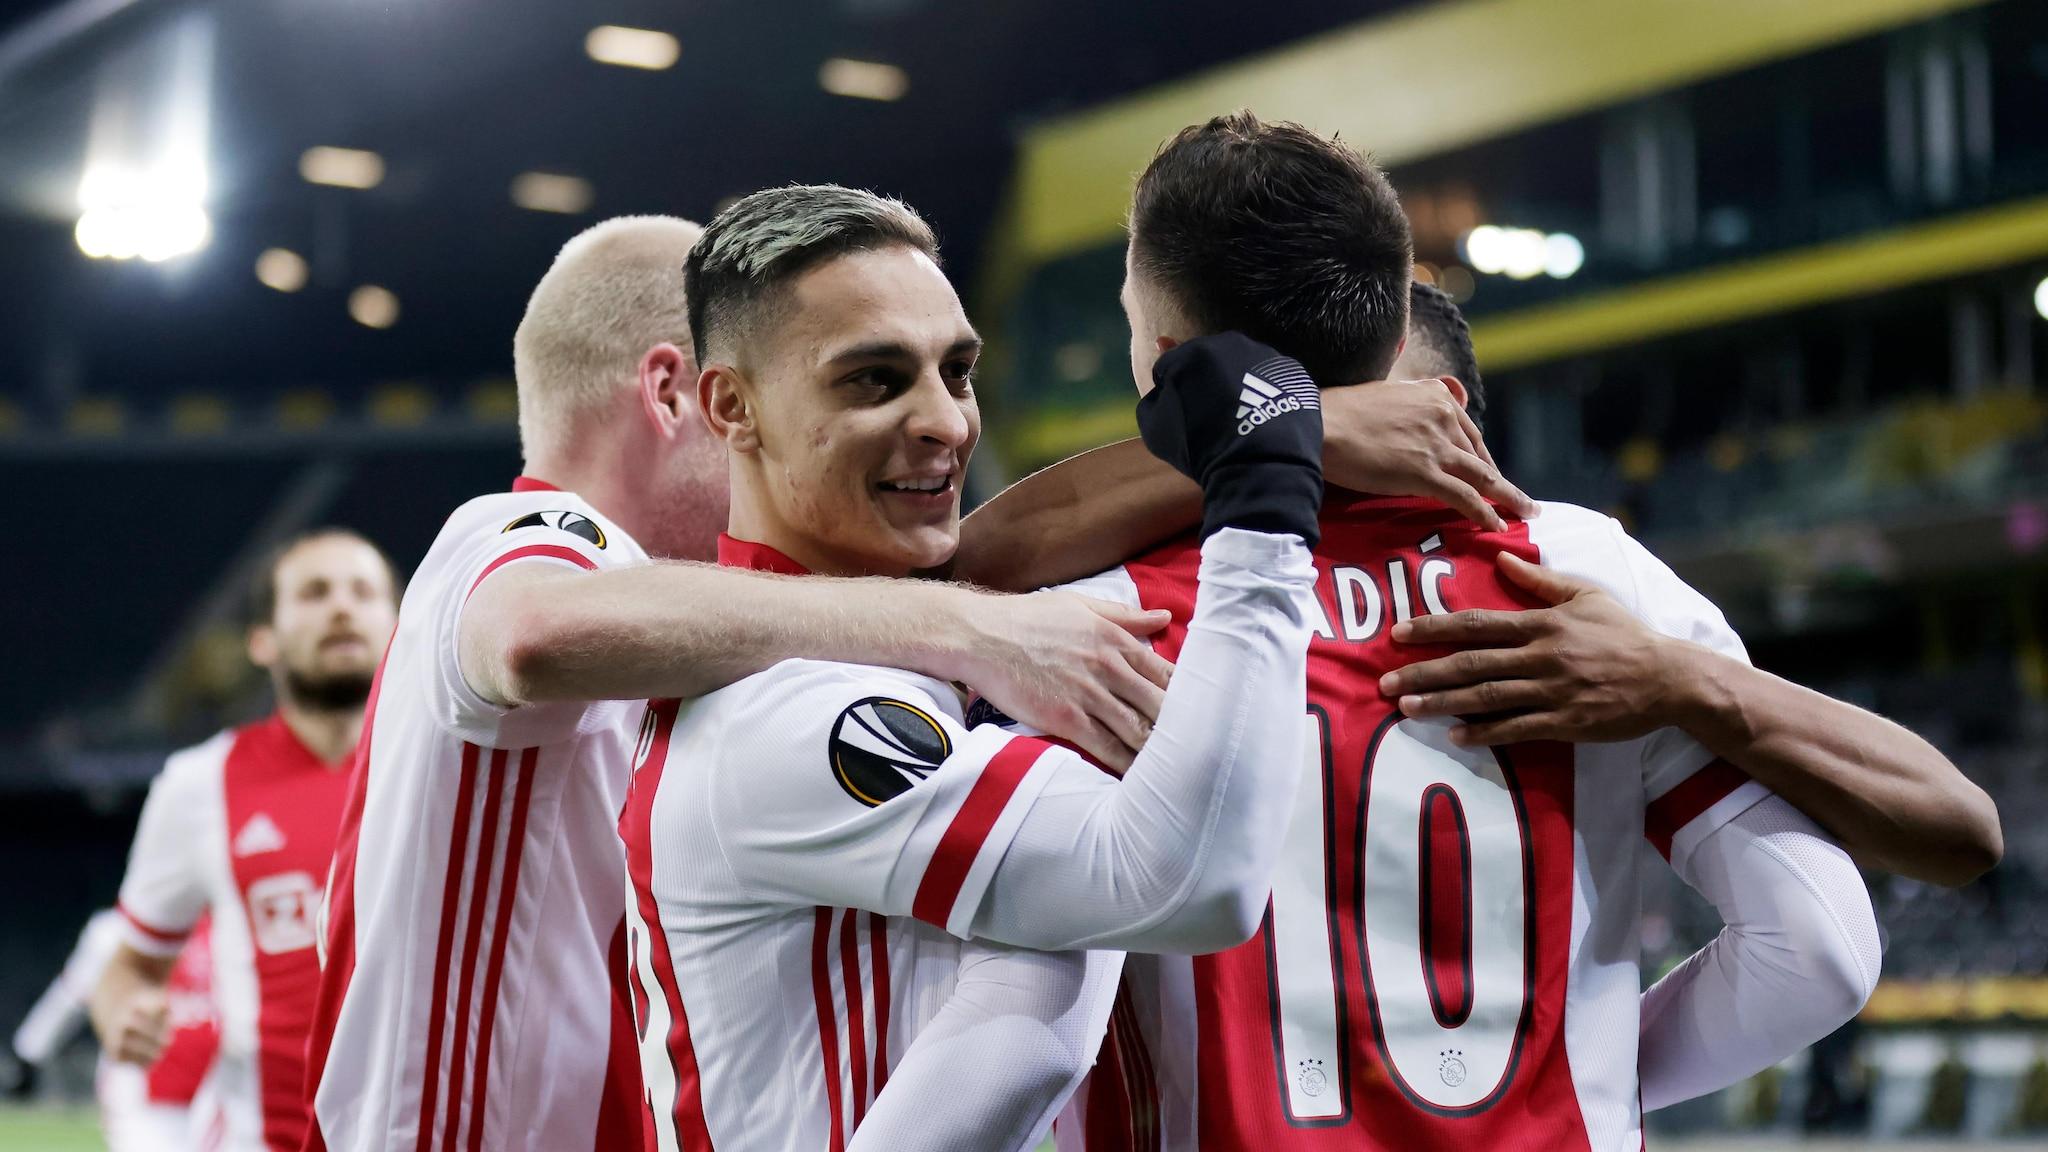 Ajax-Roma | Ajax vs Roma Europa League preview: where to watch, team news,  predictions | UEFA Europa League | UEFA.com